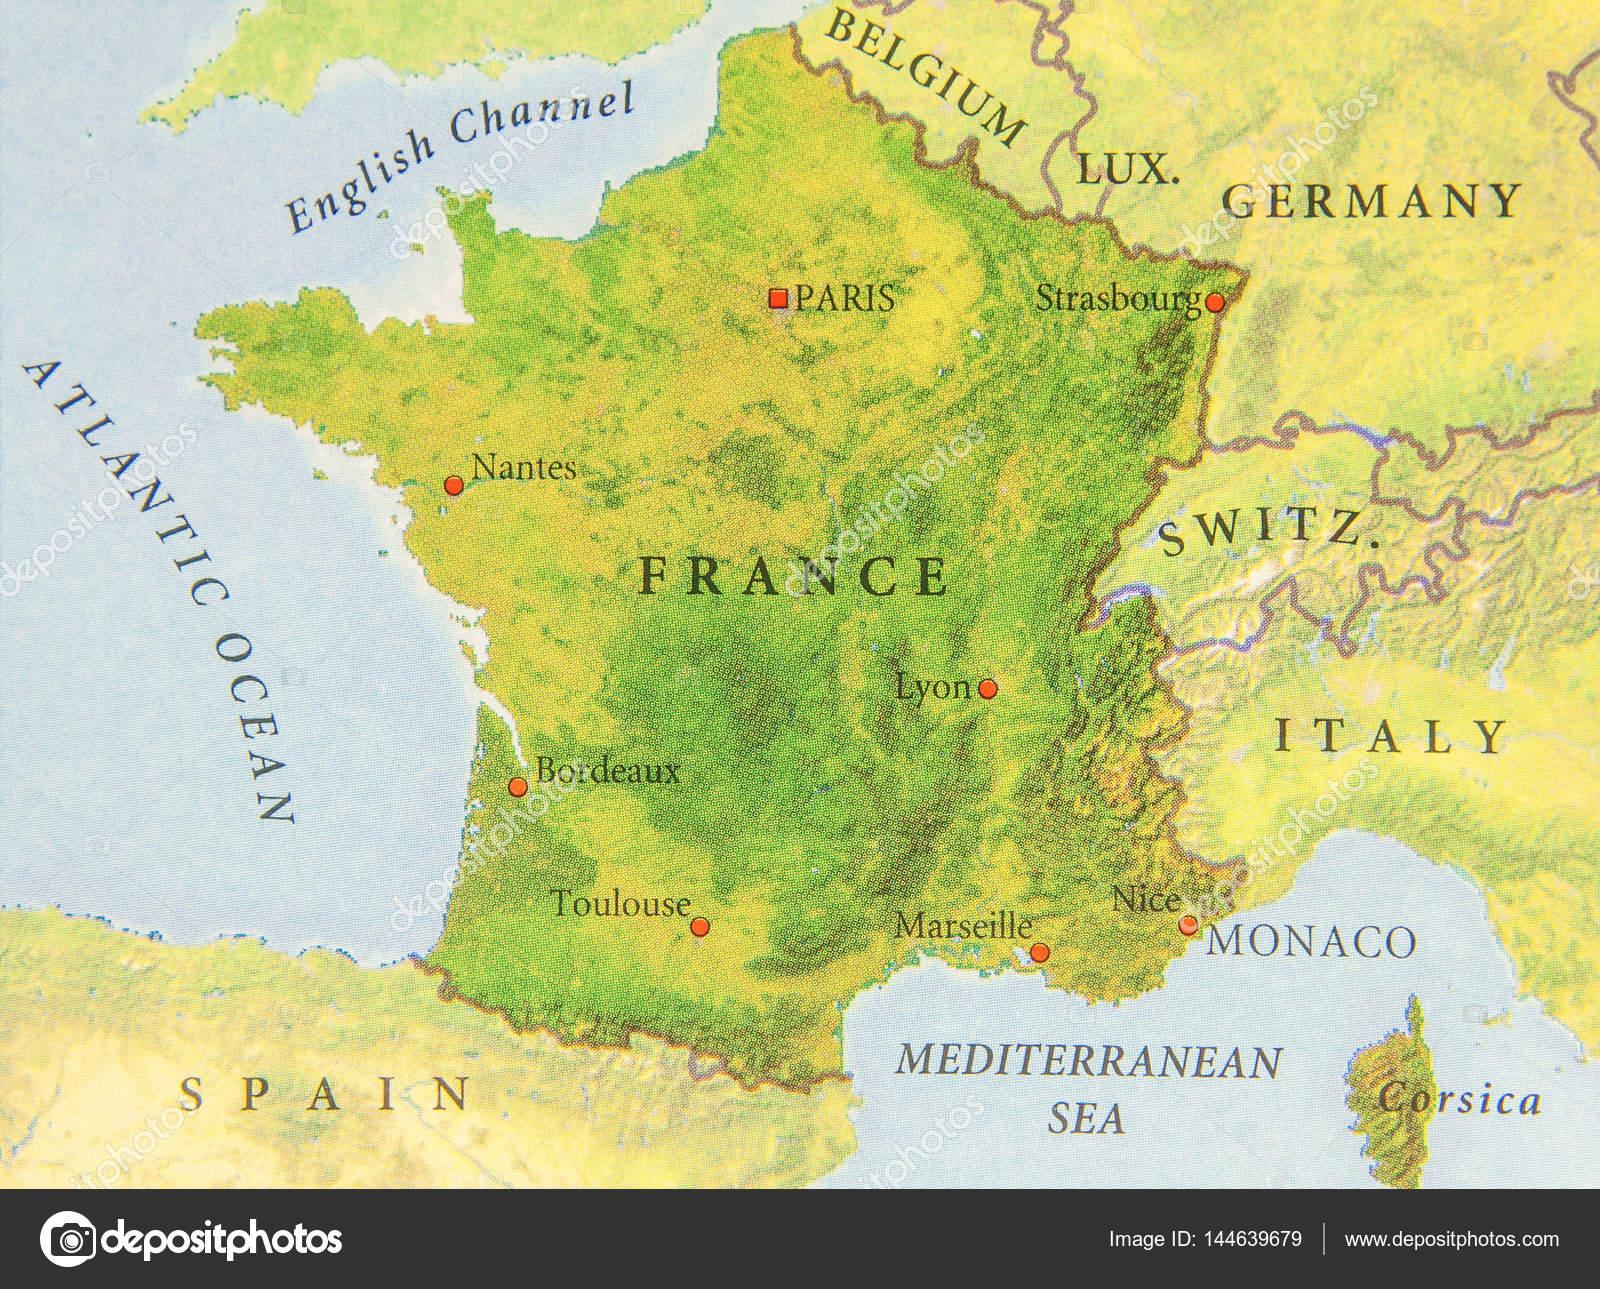 Francia Cartina Geografica.Cartina Geografica Del Paese Europeo Francia Nelle Vicinanze